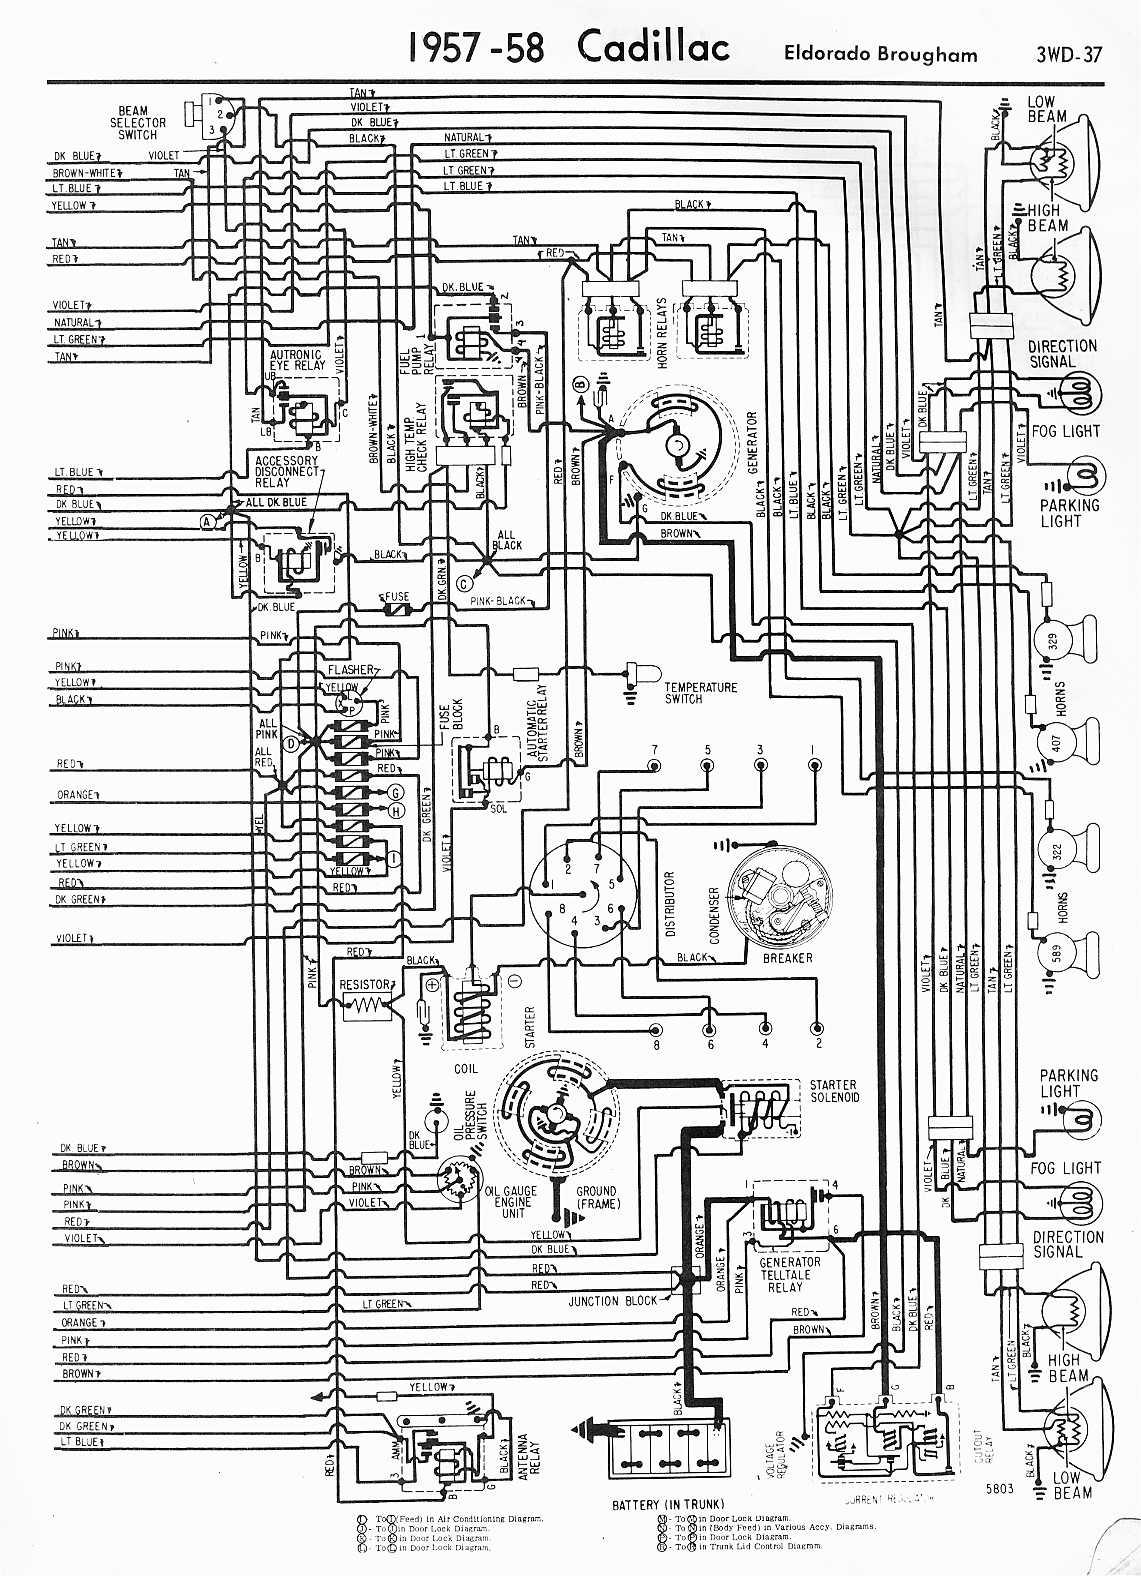 Strange Dean Cadillac Wiring Diagram Wiring Diagram Wiring Cloud Timewinrebemohammedshrineorg